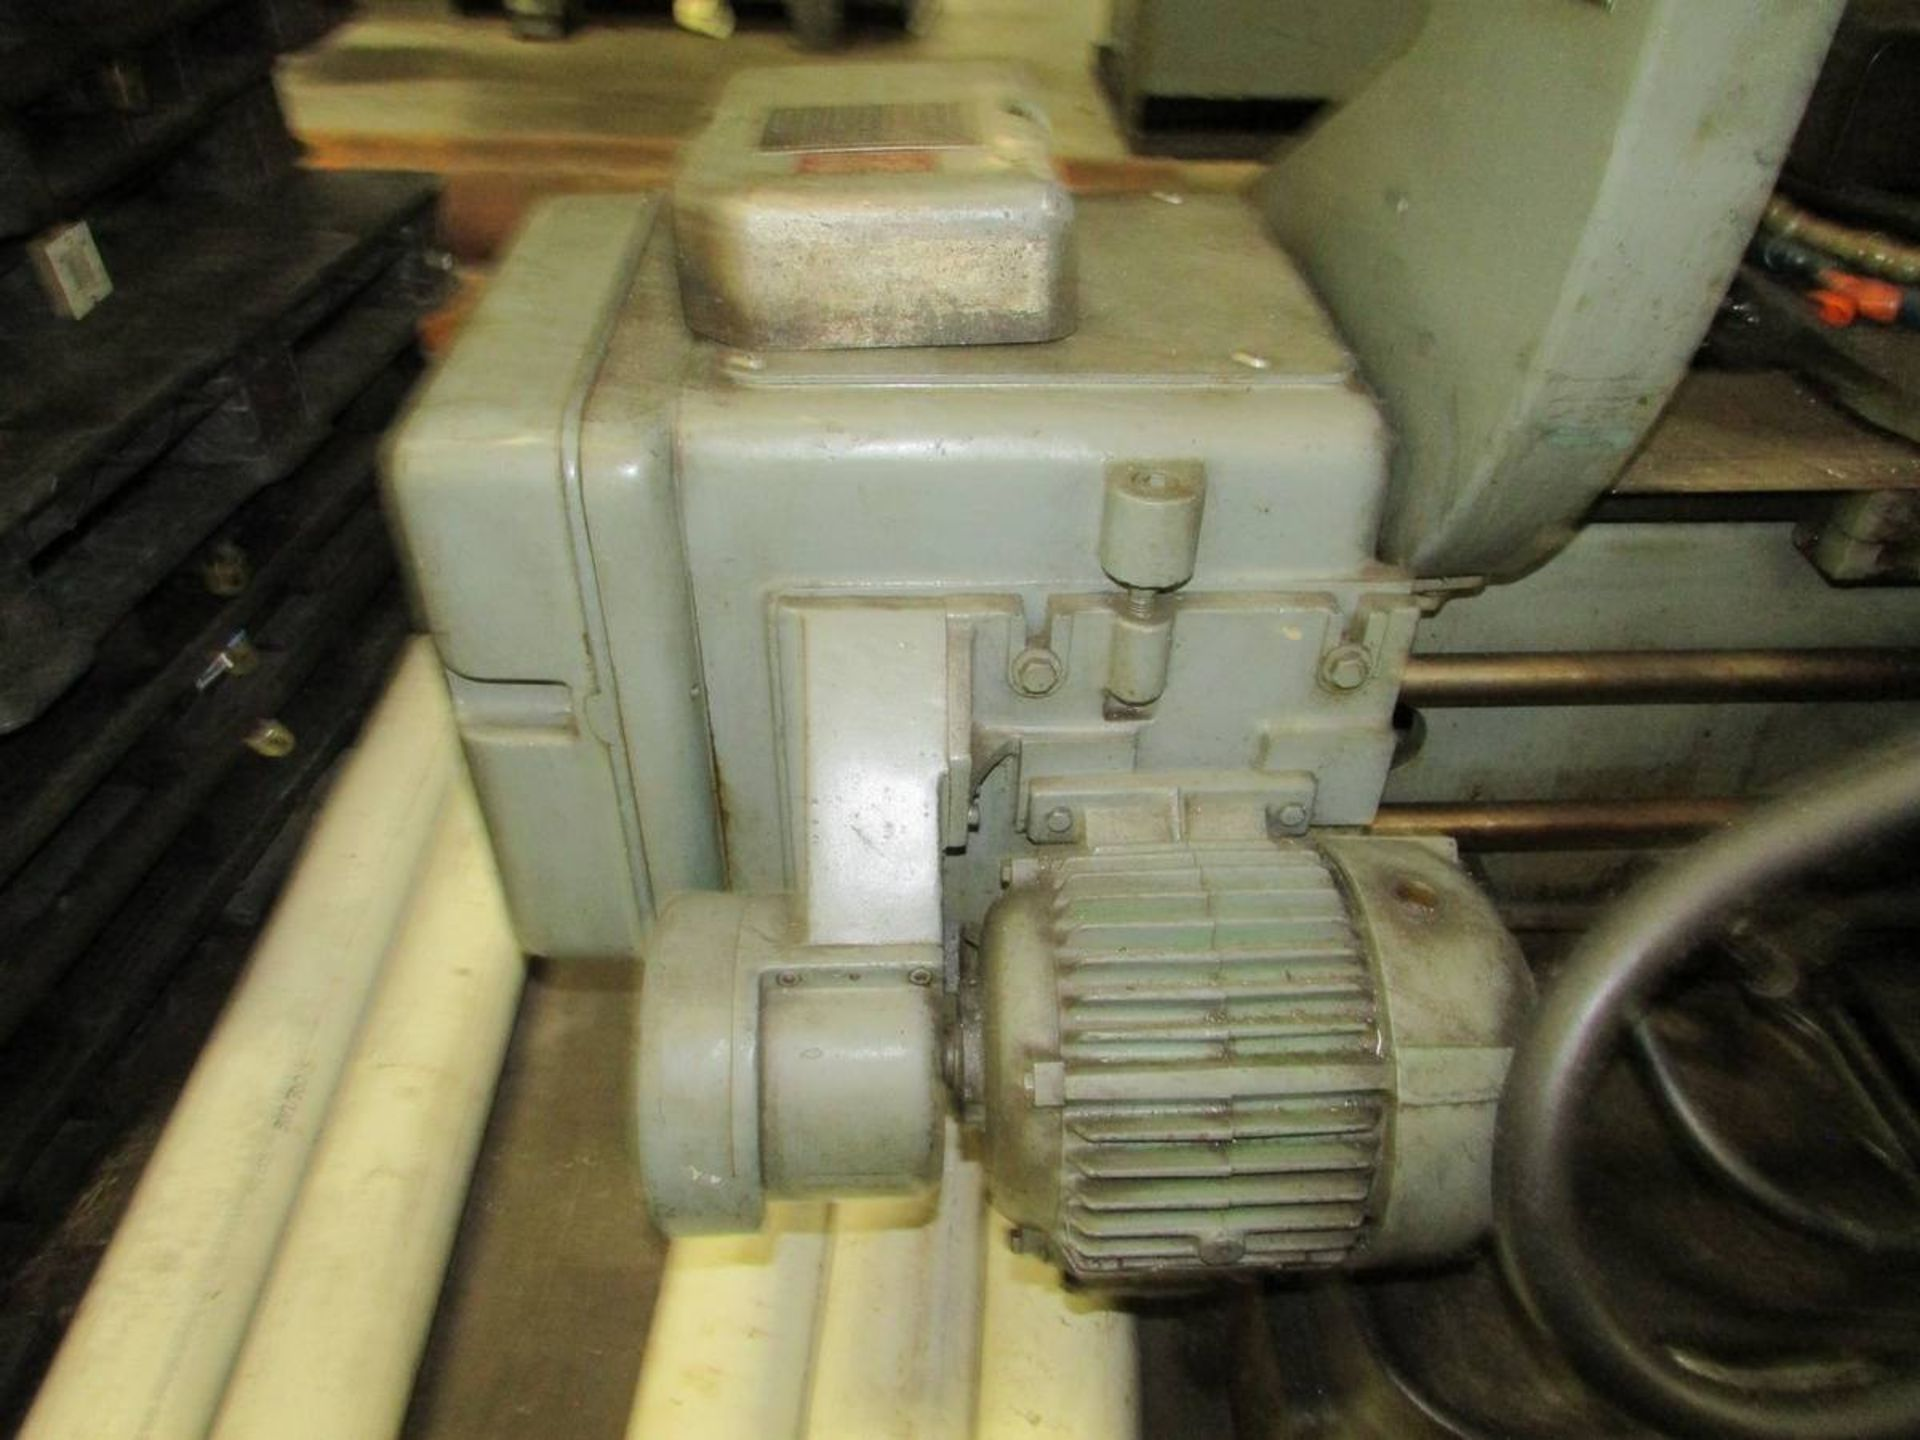 Barber Colman 16-16 Gear Hobbing Machine - Image 14 of 24